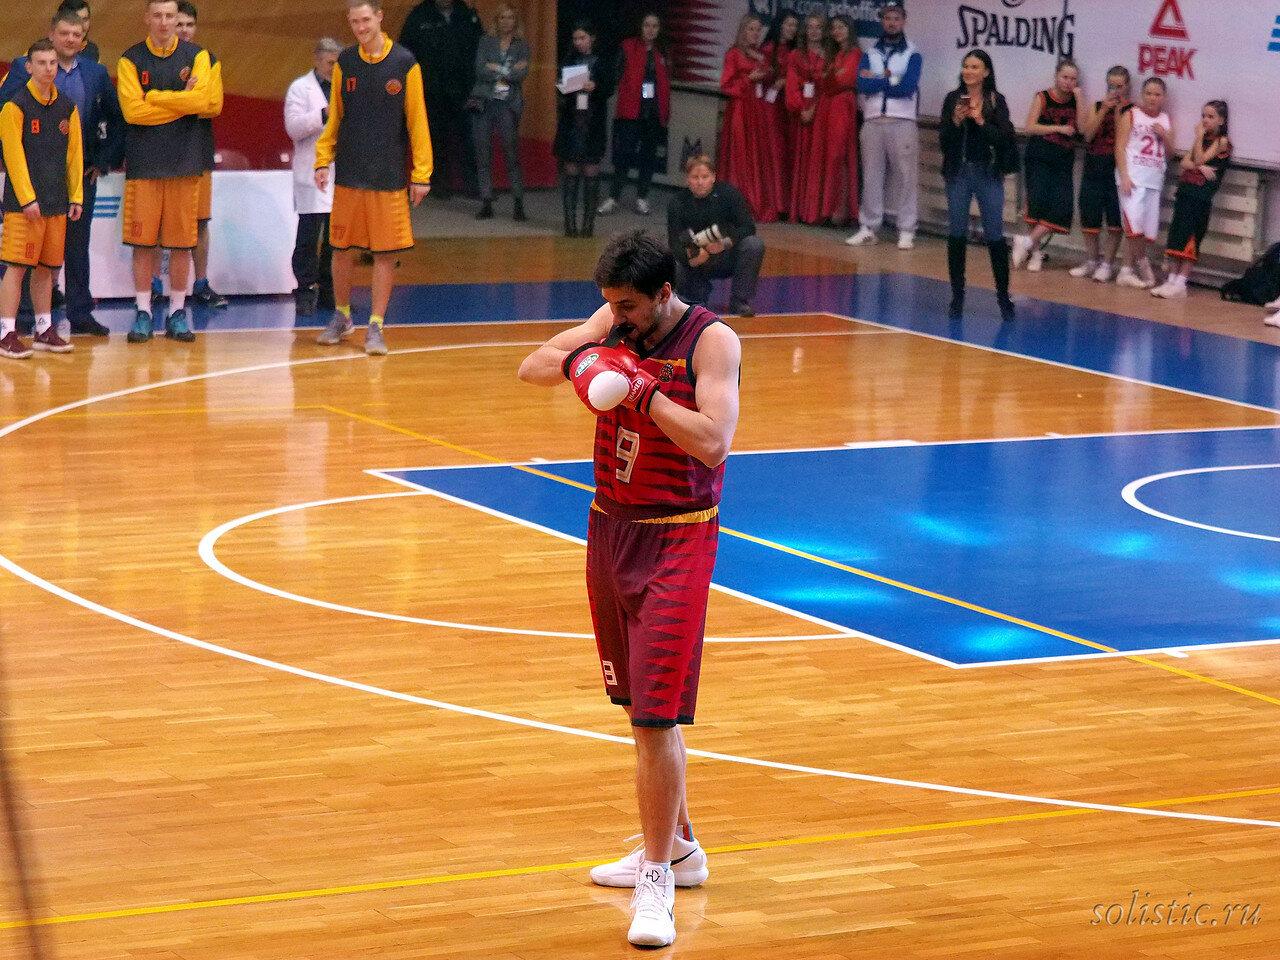 117 Матч звезд АСБ 2018 (ассоциации студенческого баскетбола)